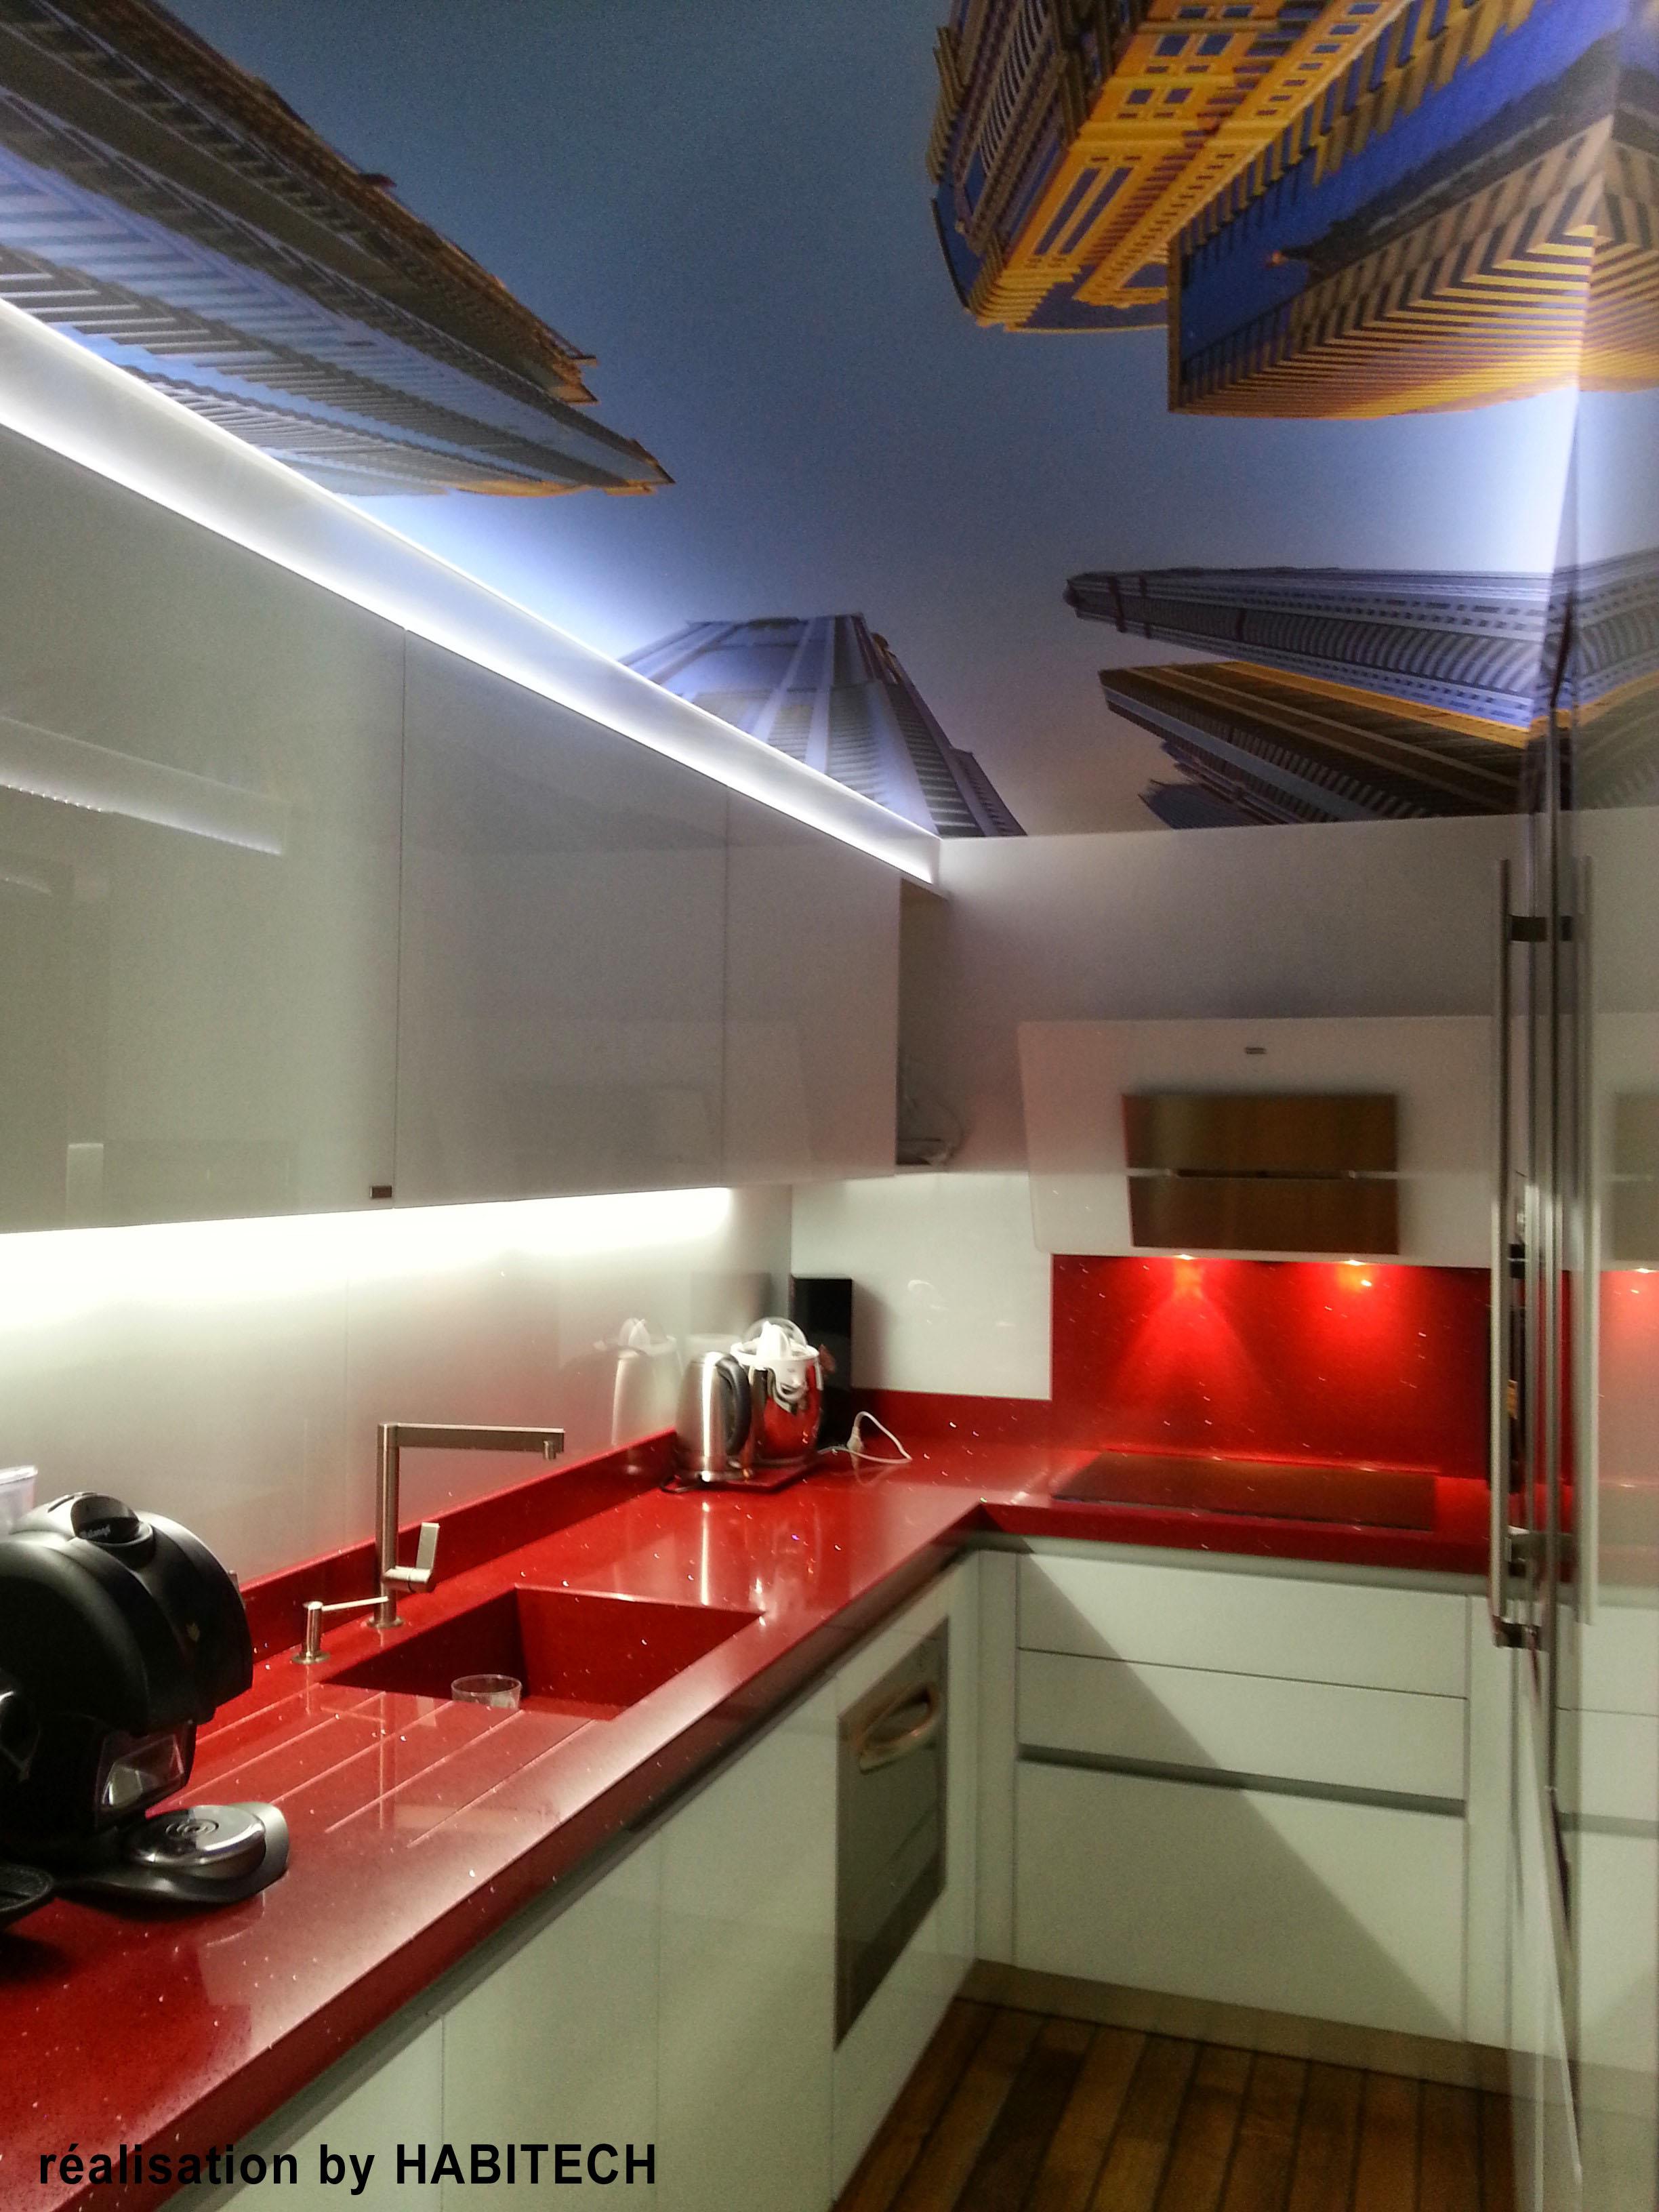 Piano de cuisson lacanche prix table de cuisine for Prix d un piano de cuisson